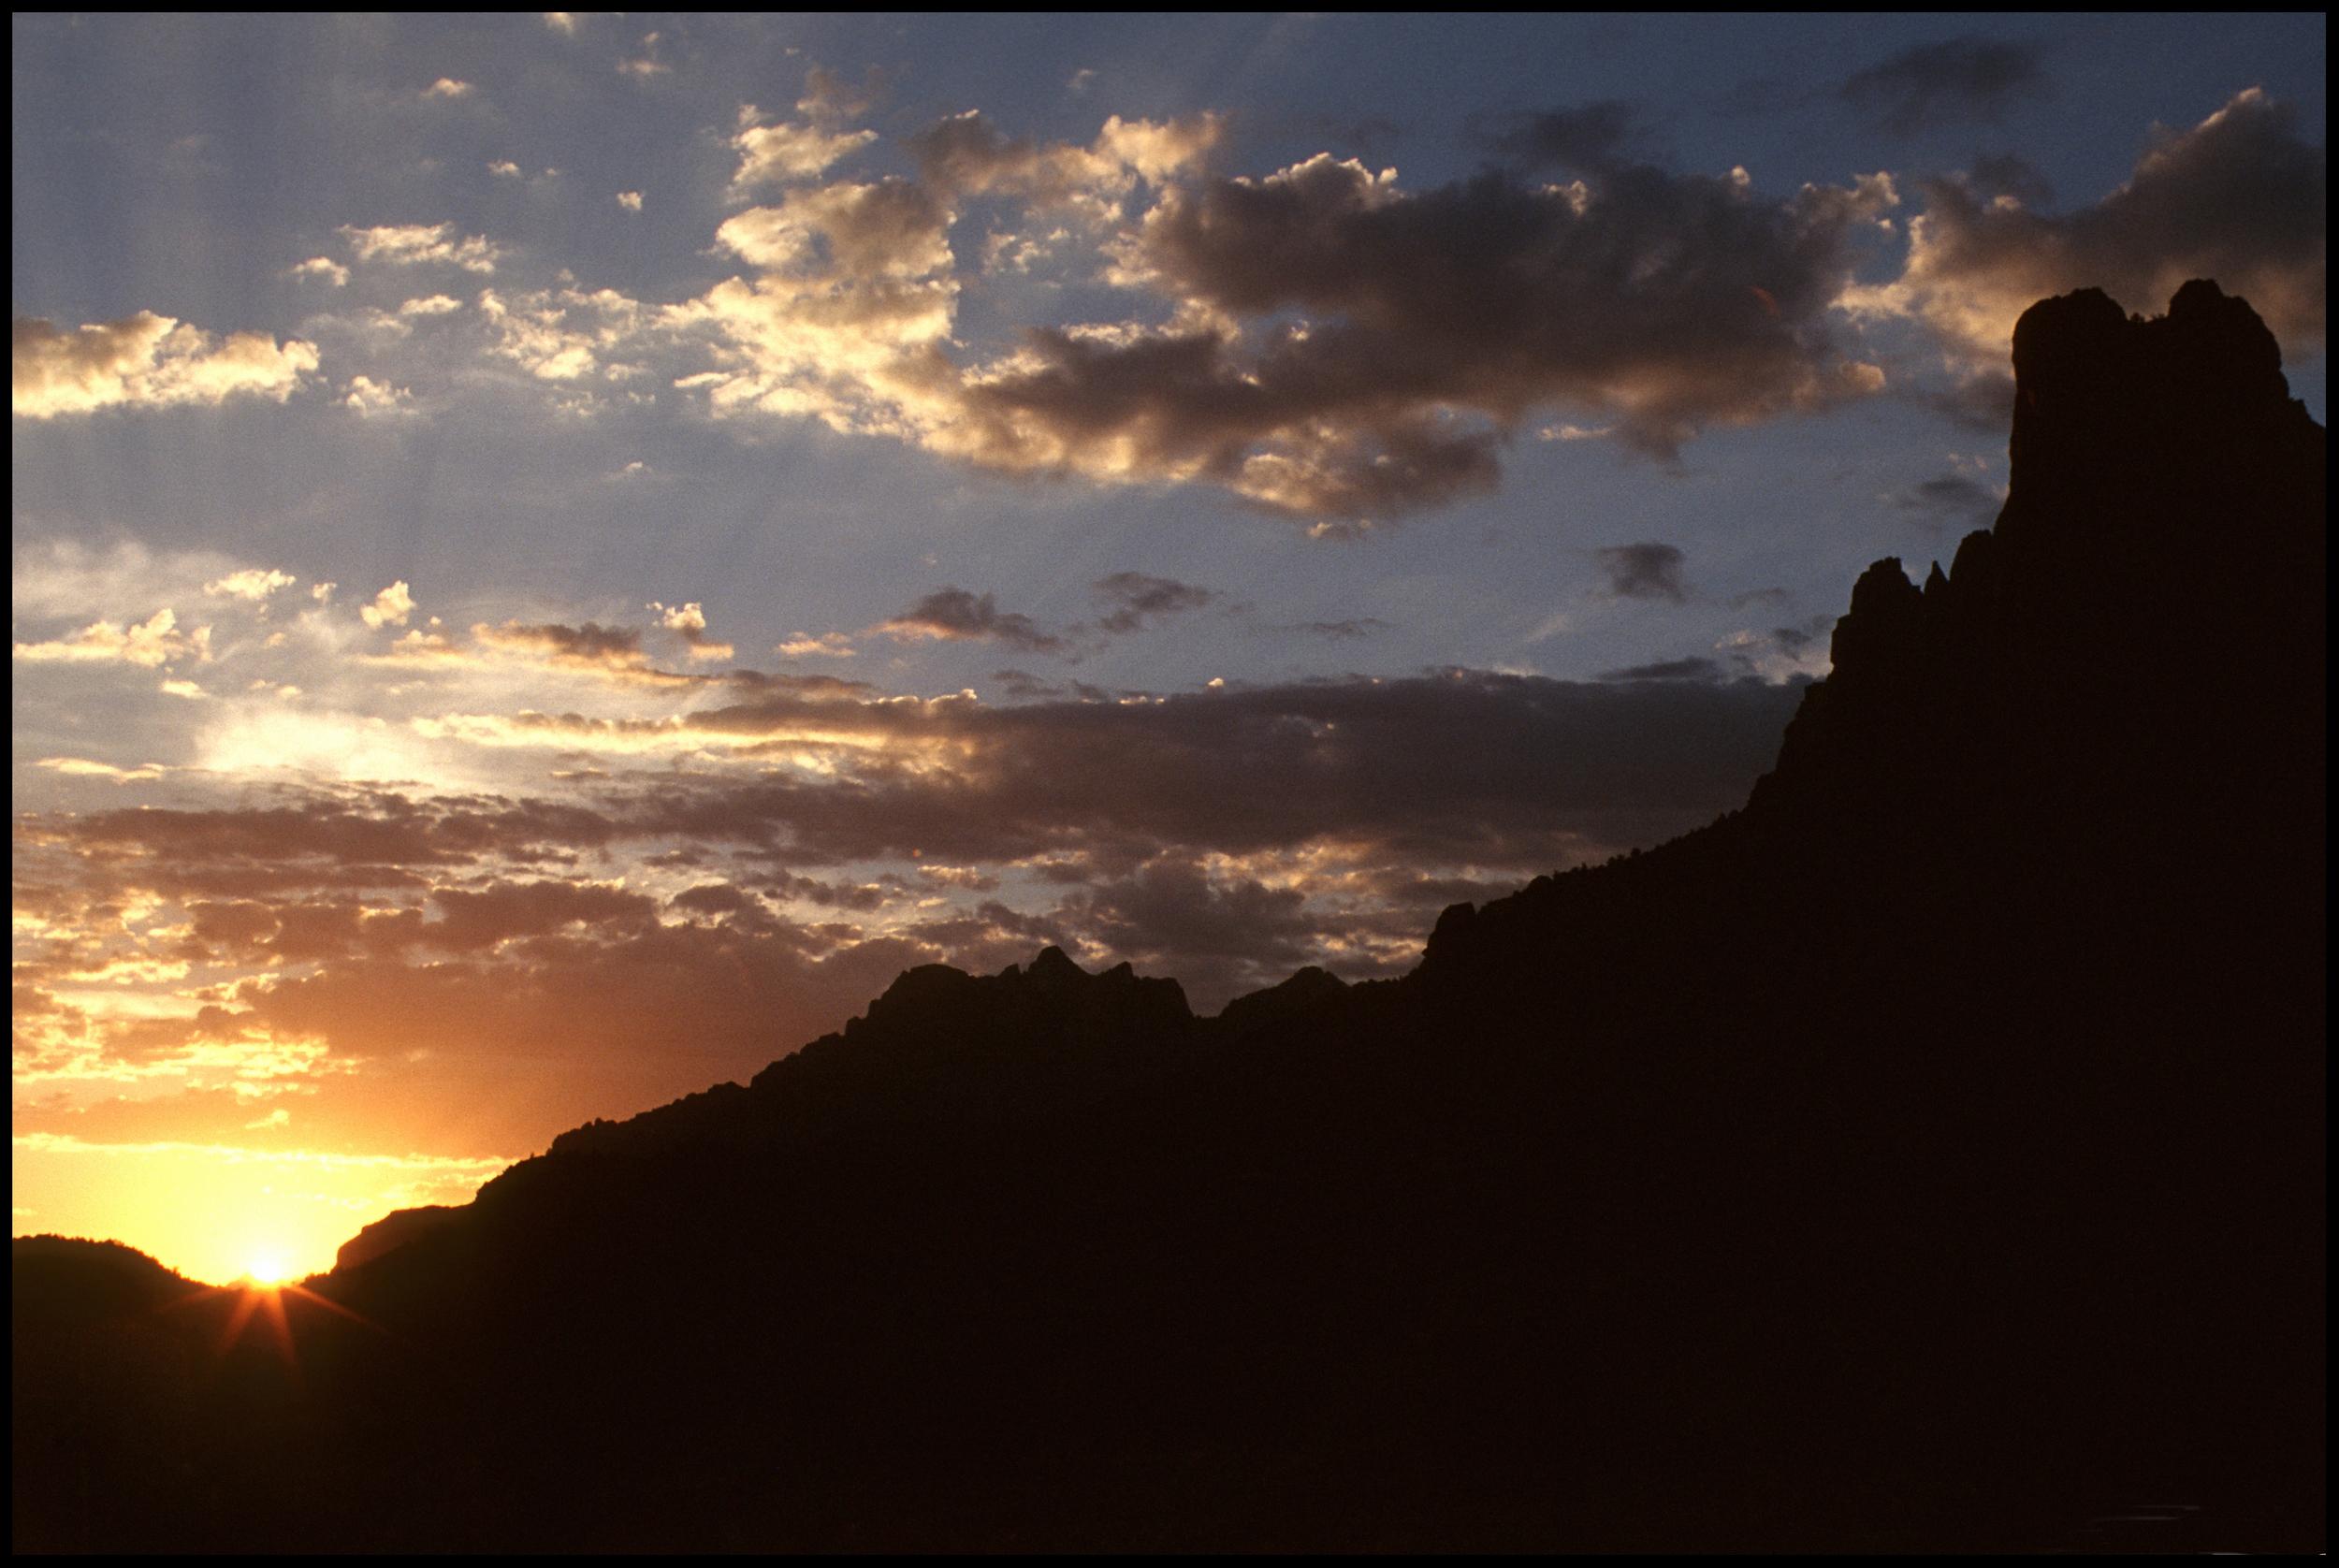 Parunuweap Canyon, Zion National Park, UT